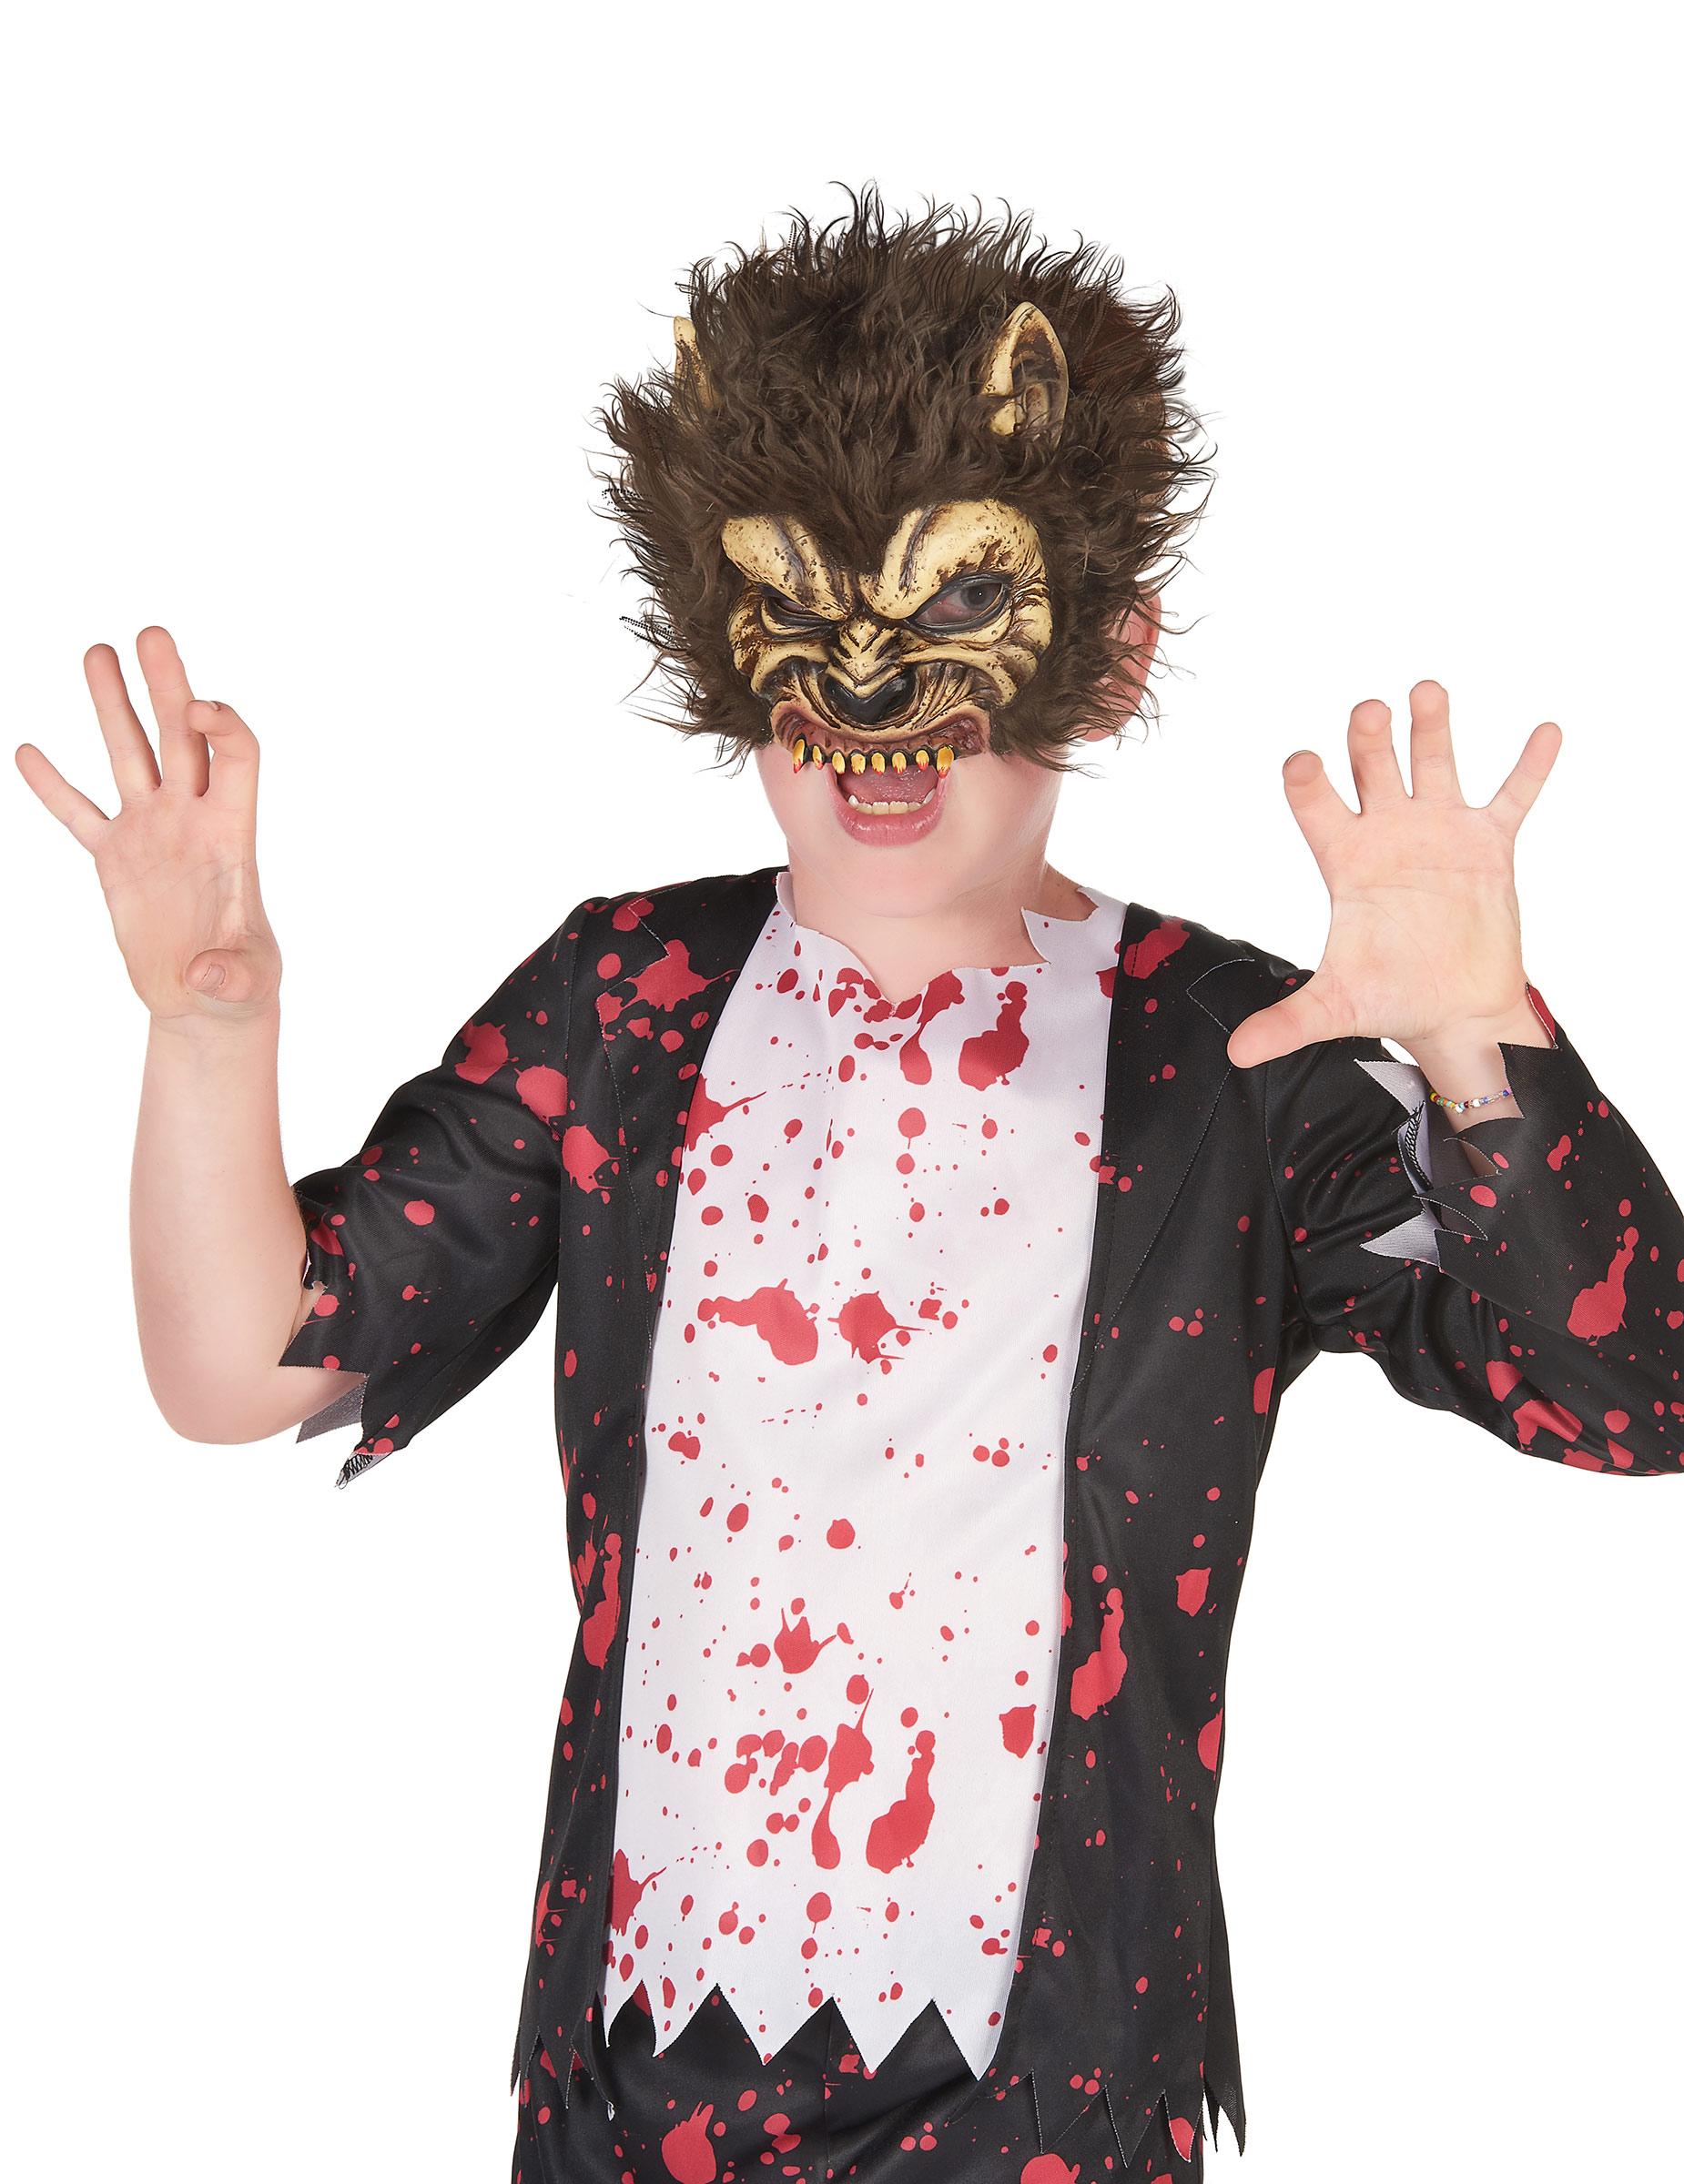 werwolf maske f r kinder halloweenmaske braun g nstige faschings masken bei karneval megastore. Black Bedroom Furniture Sets. Home Design Ideas